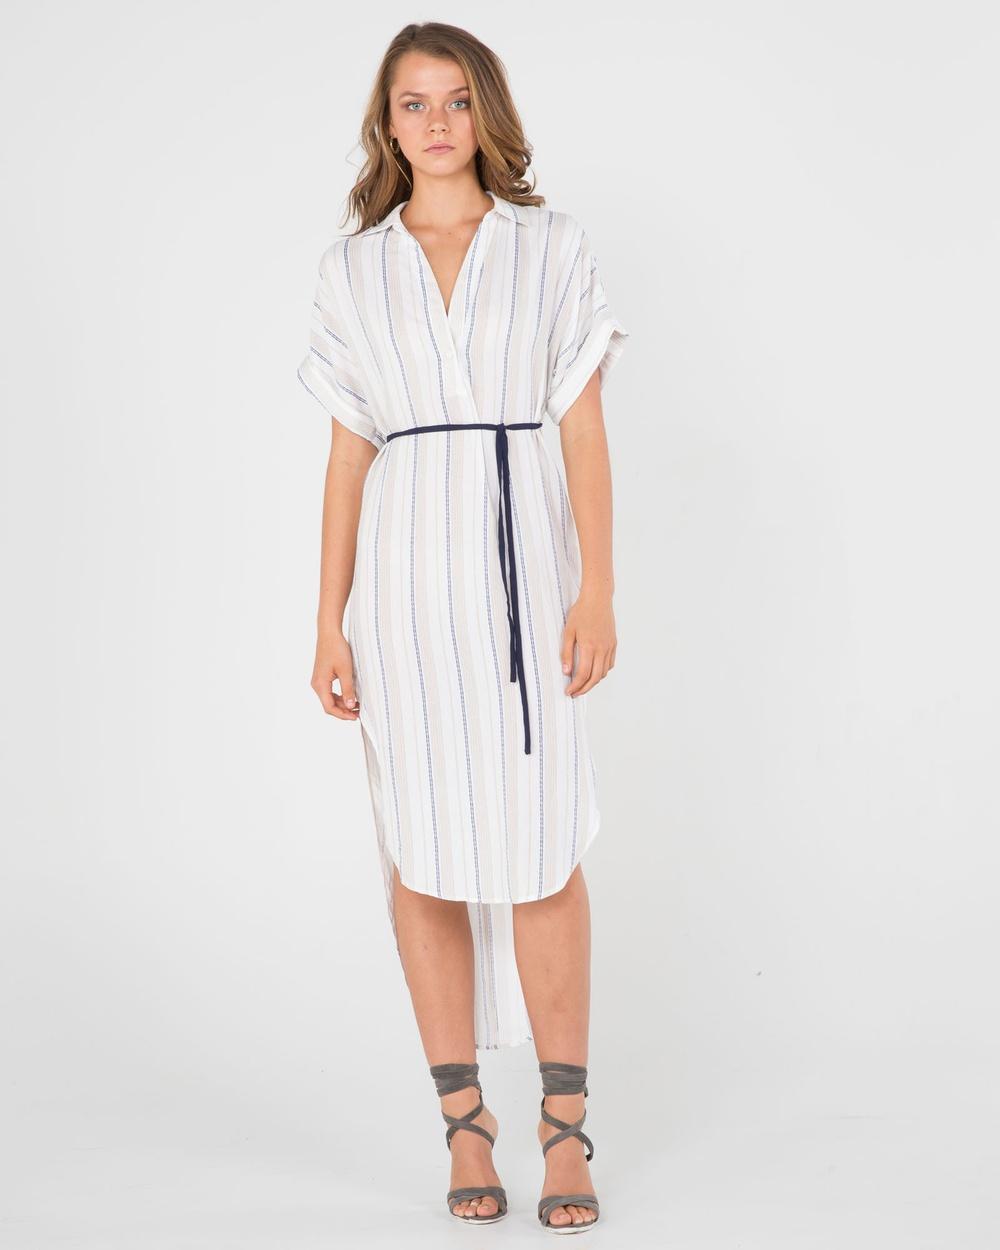 Amelius Mariner Hi Lo Dress Dresses Stripe Mariner Hi-Lo Dress